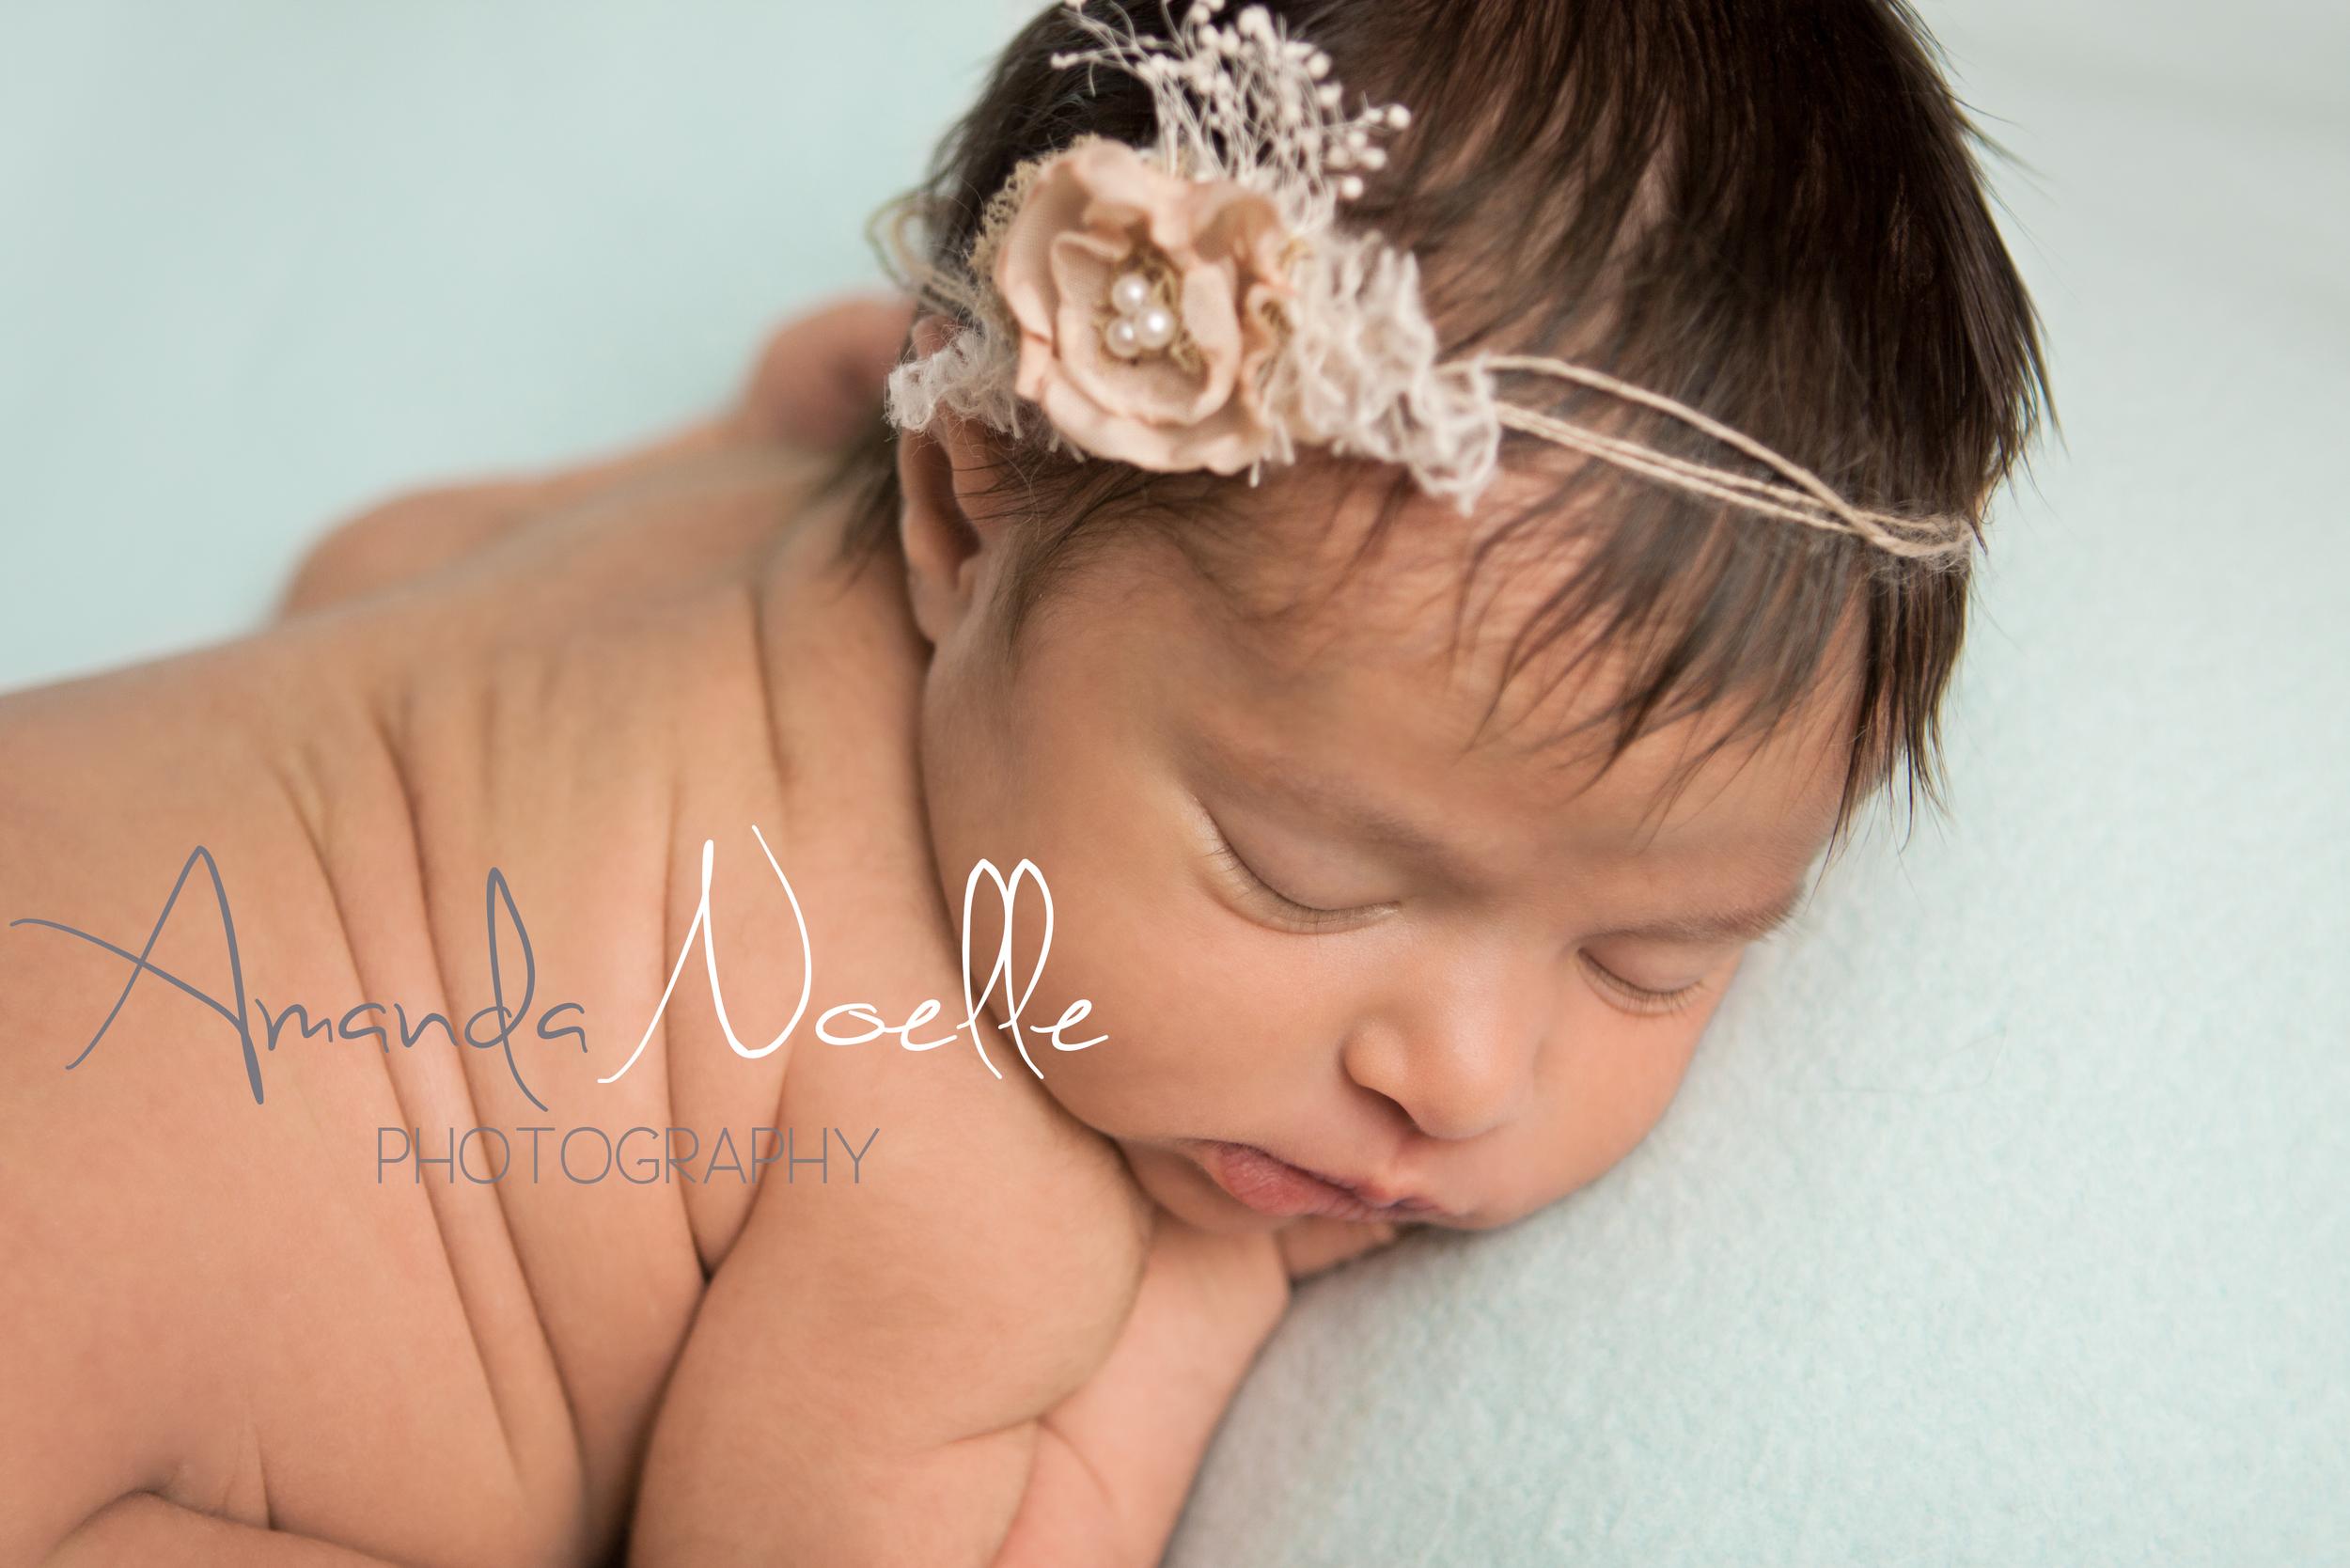 Newborn baby girl sleeping with shabby chic pink flower tieback  headband on teal mint aqua fabric backdrop, tushy upbeanbag pose, Westchester, County New York Newborn Photographer, Amanda Noelle Photography.